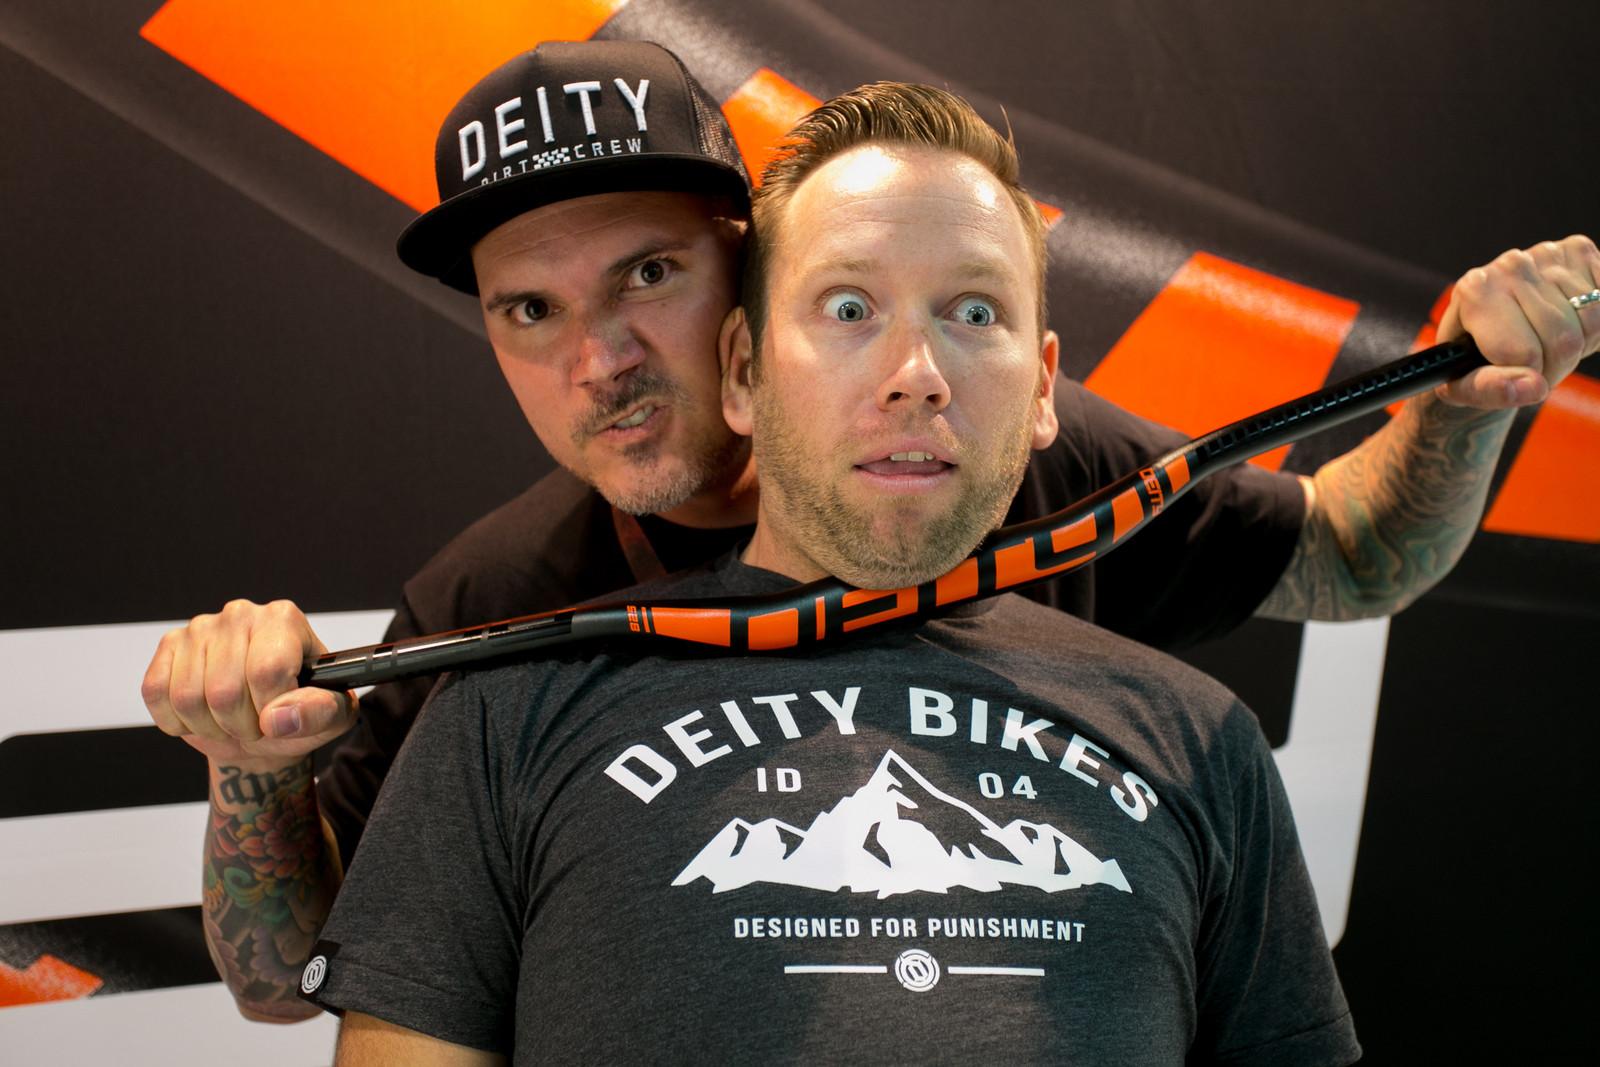 2017 Deity Components at Interbike - INTERBIKE - 2017 Mountain Bike Components - Mountain Biking Pictures - Vital MTB